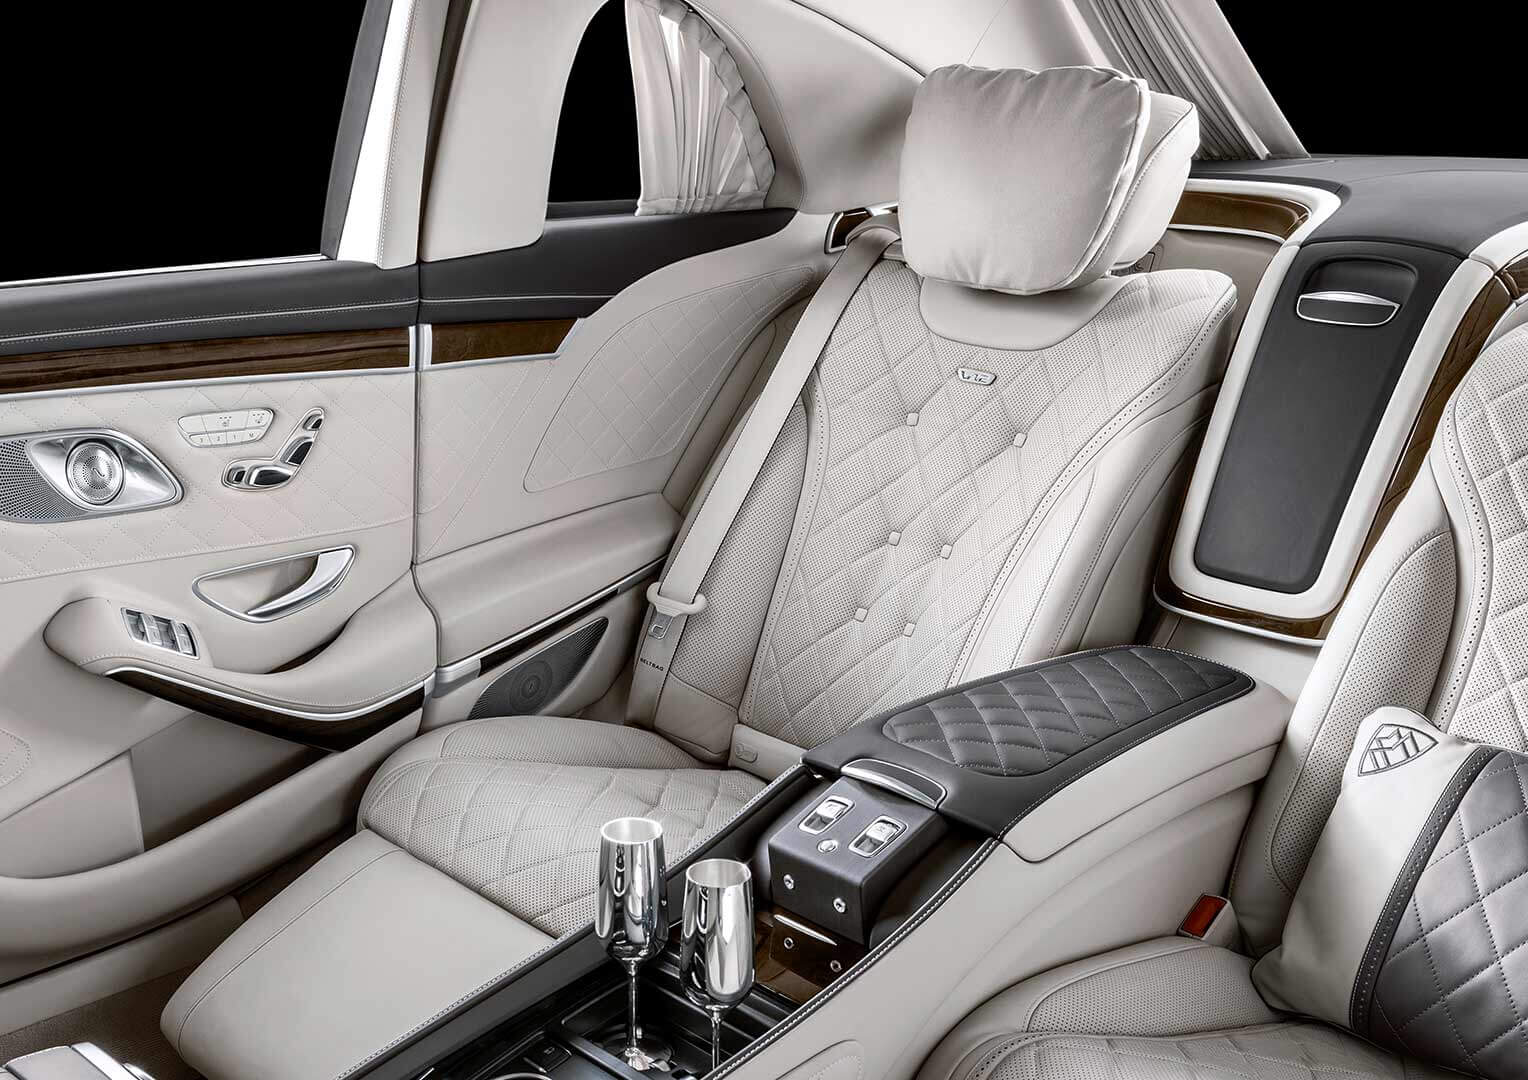 Mercedes-Maybach asientos